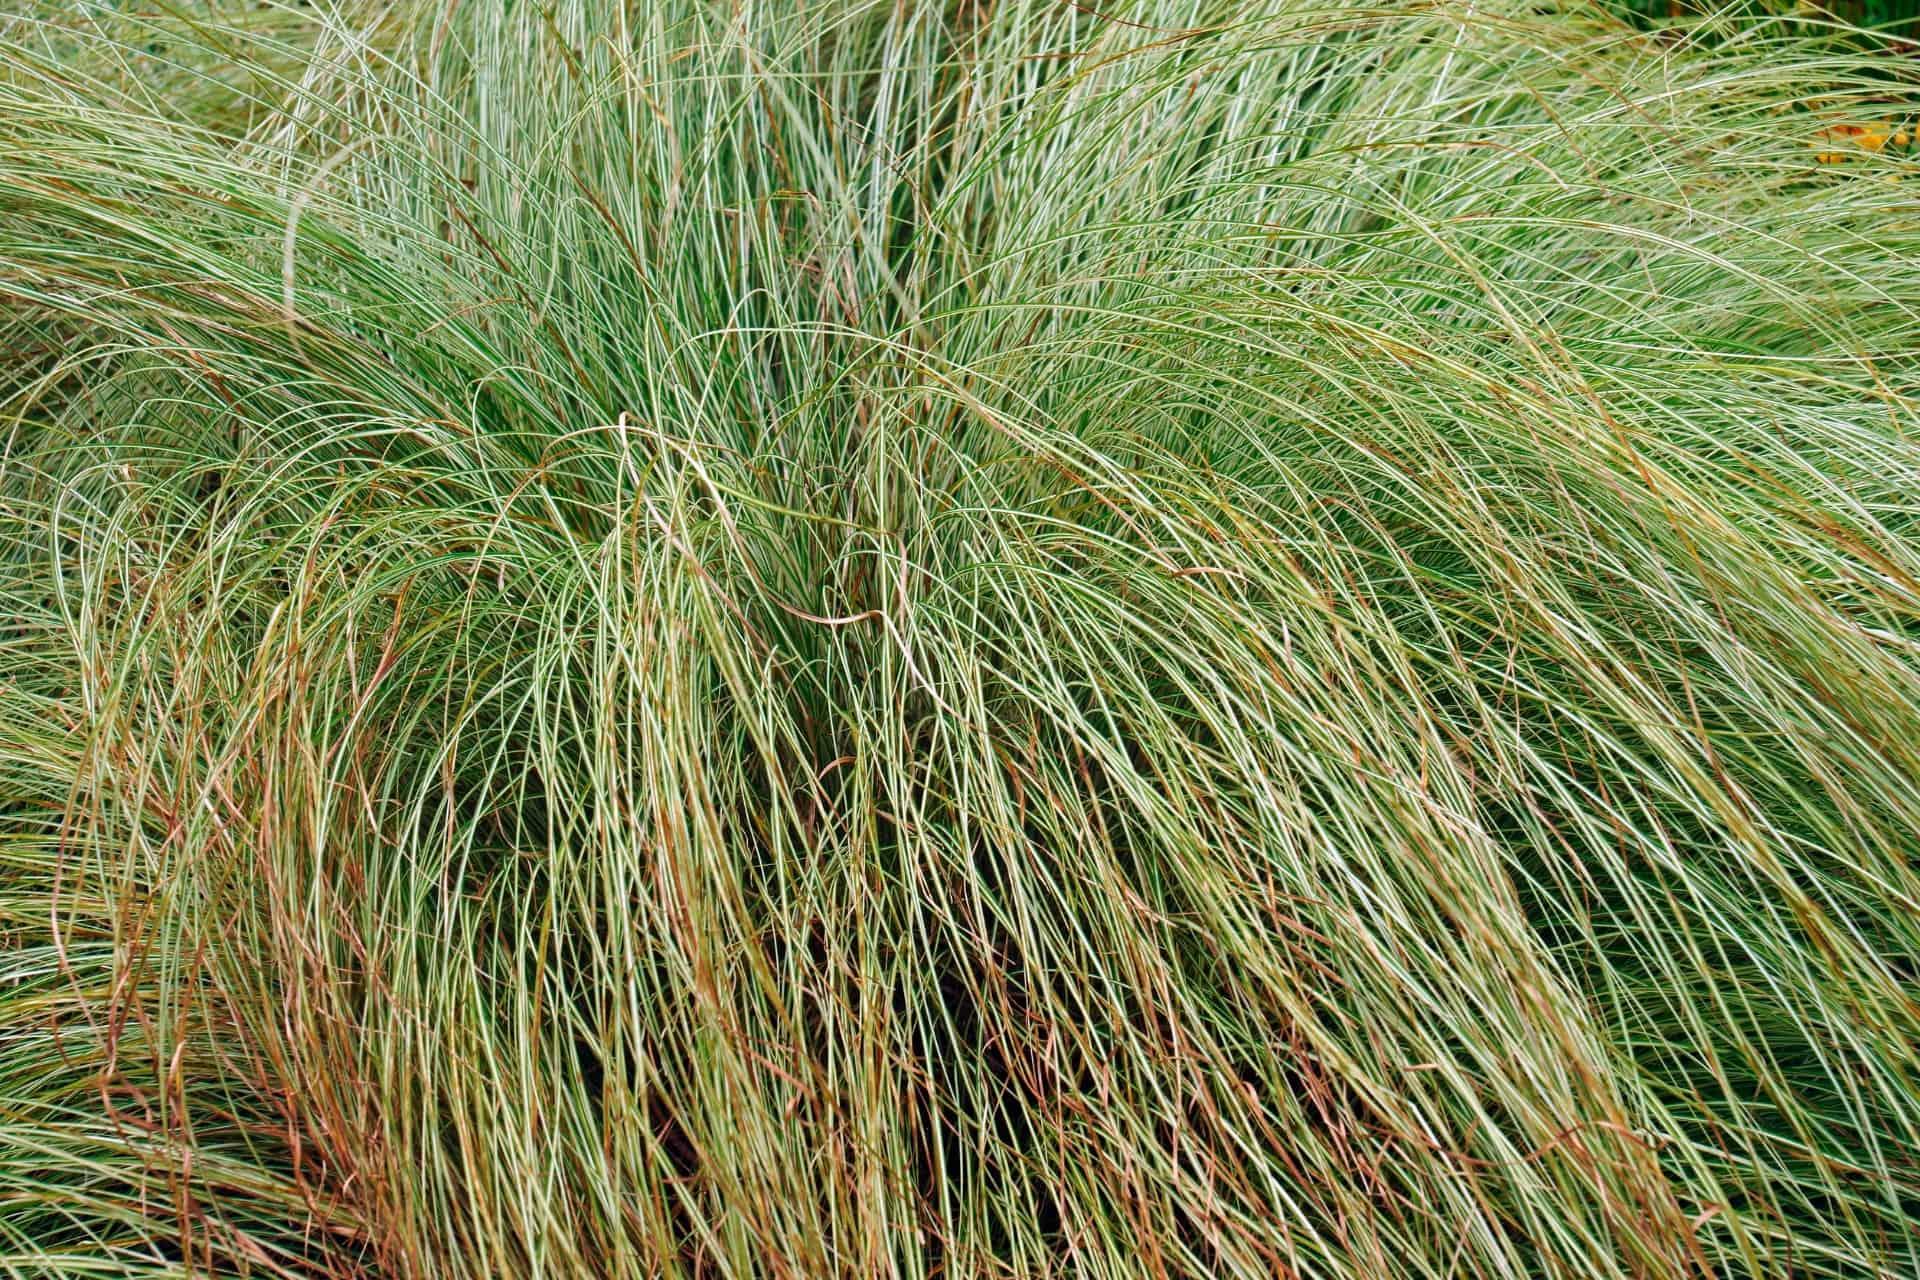 Japanese sedge is a popular dwarf grass.